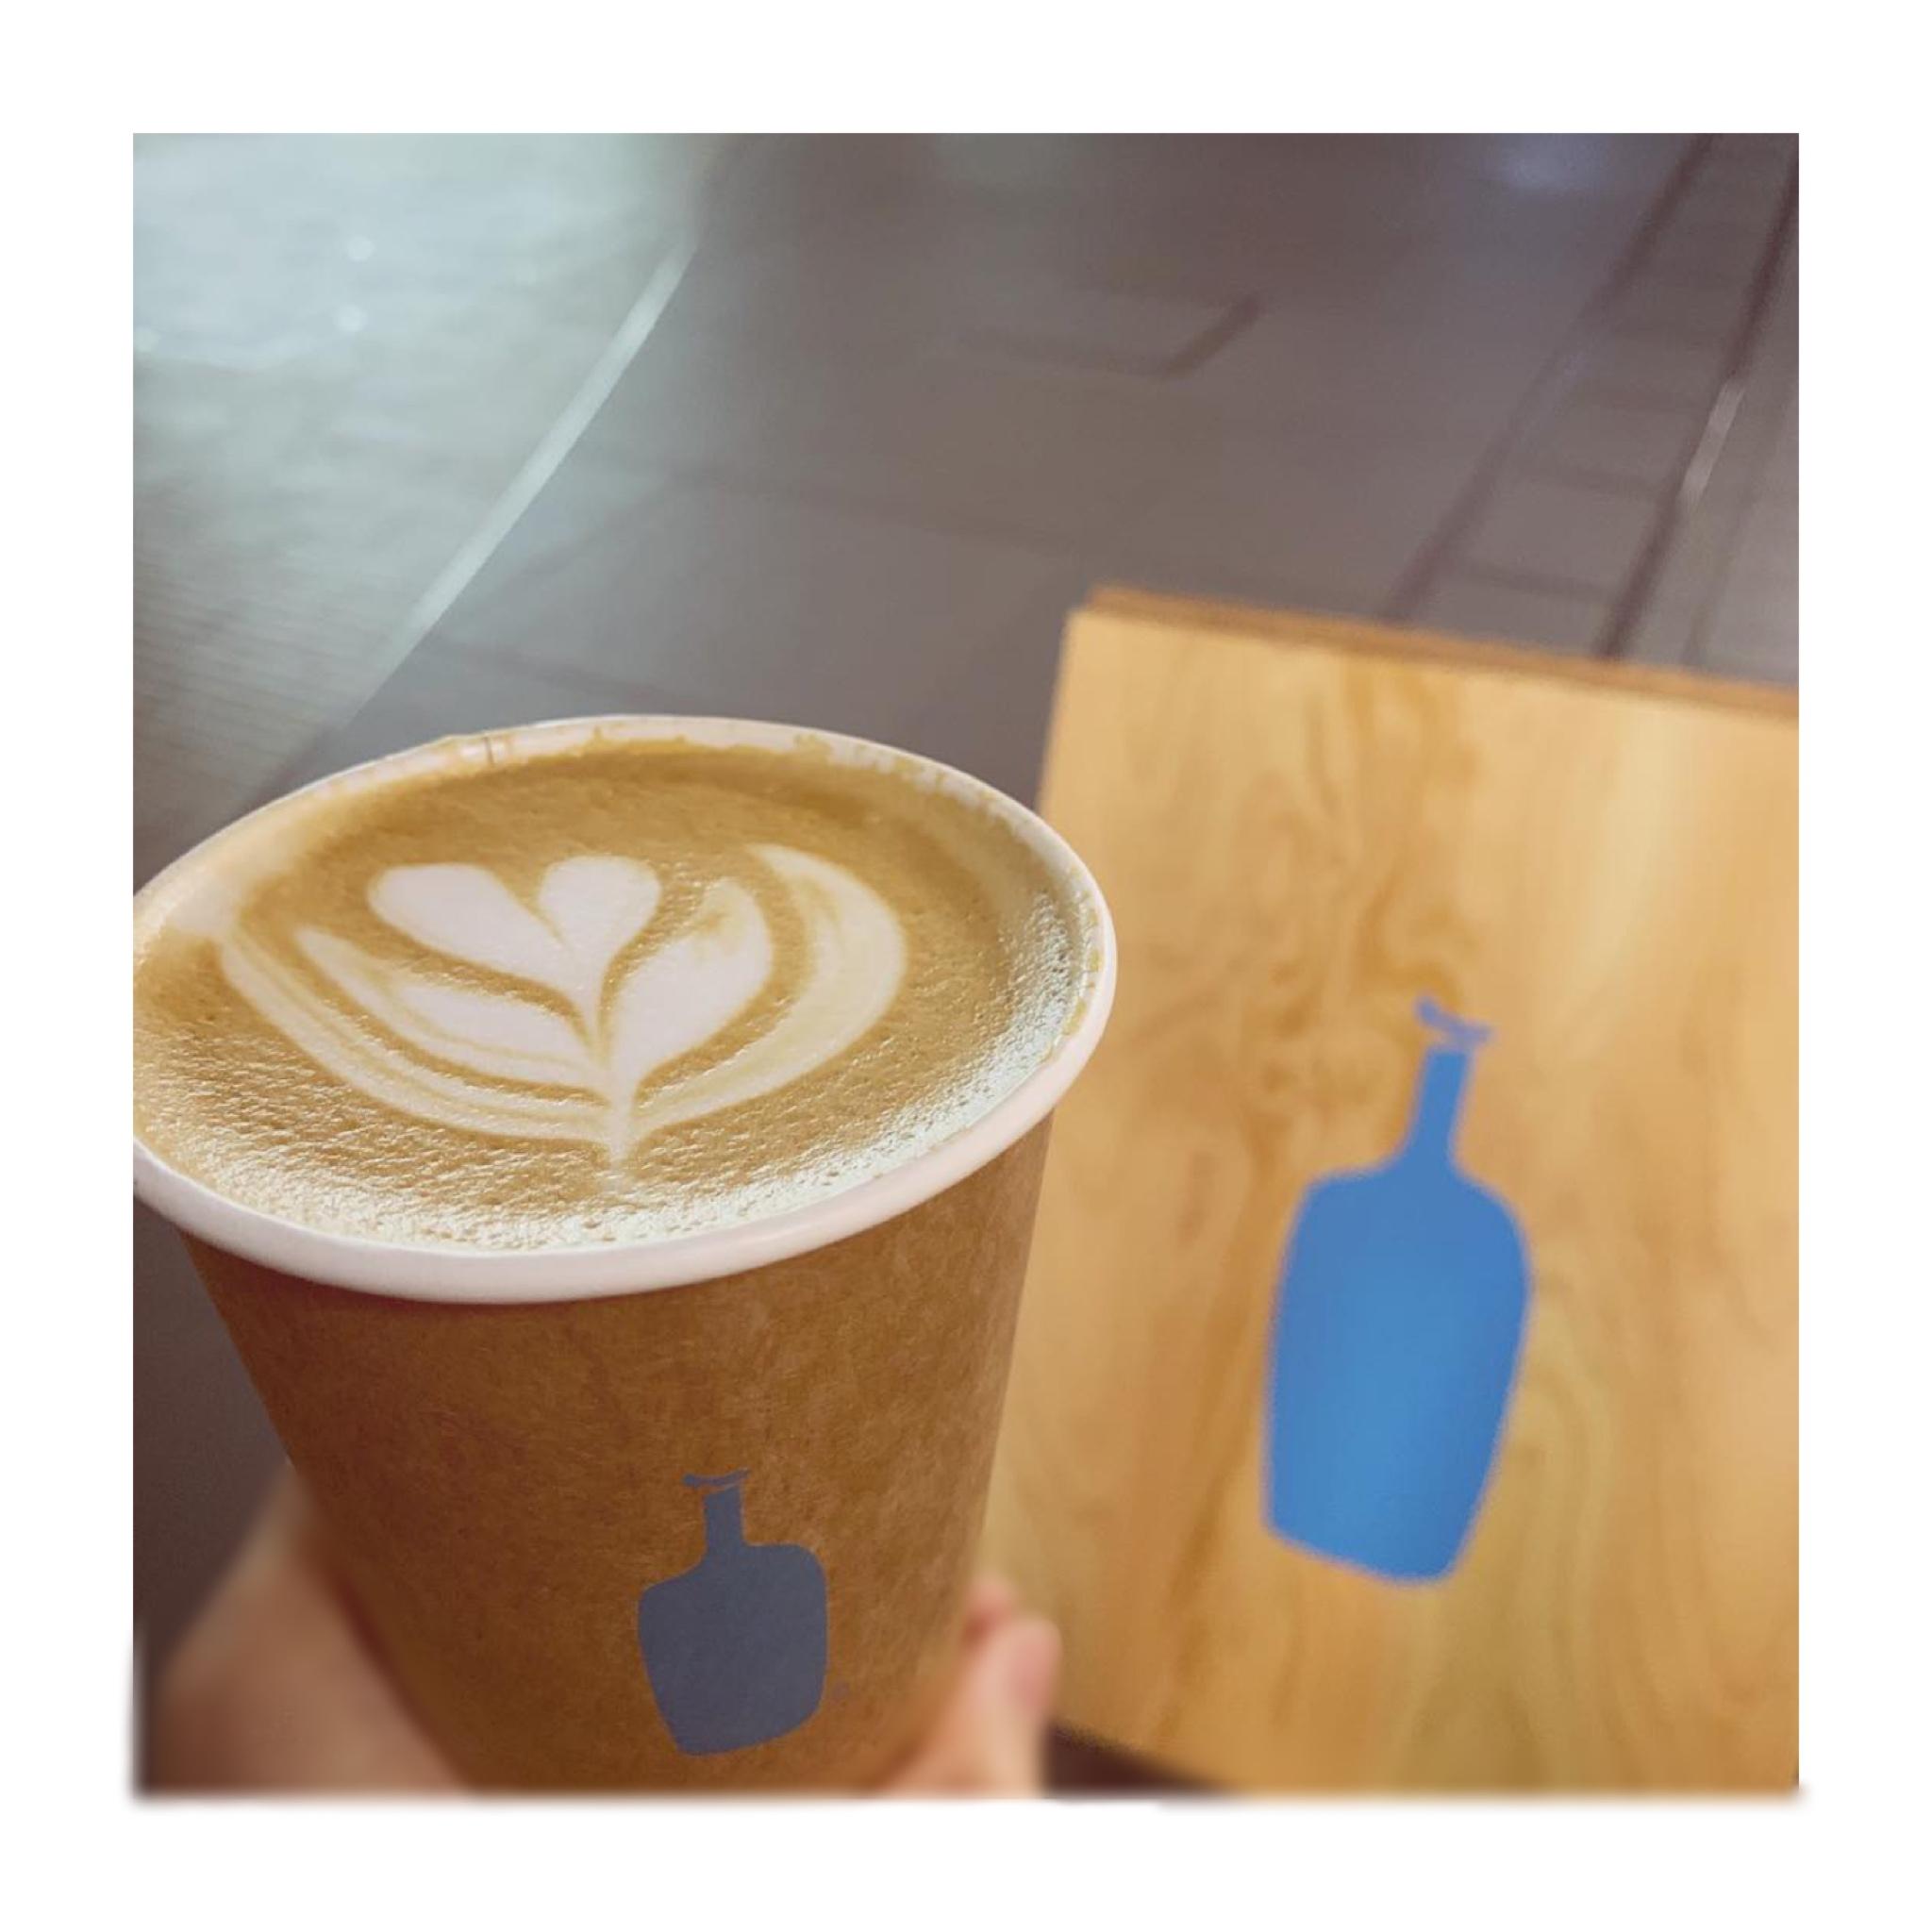 #21【#cafestagram】❤️:《東京•秋葉原》にBLUE BOTTLE COFFEE初のテイクアウト専門店がオープン☝︎❤︎_4